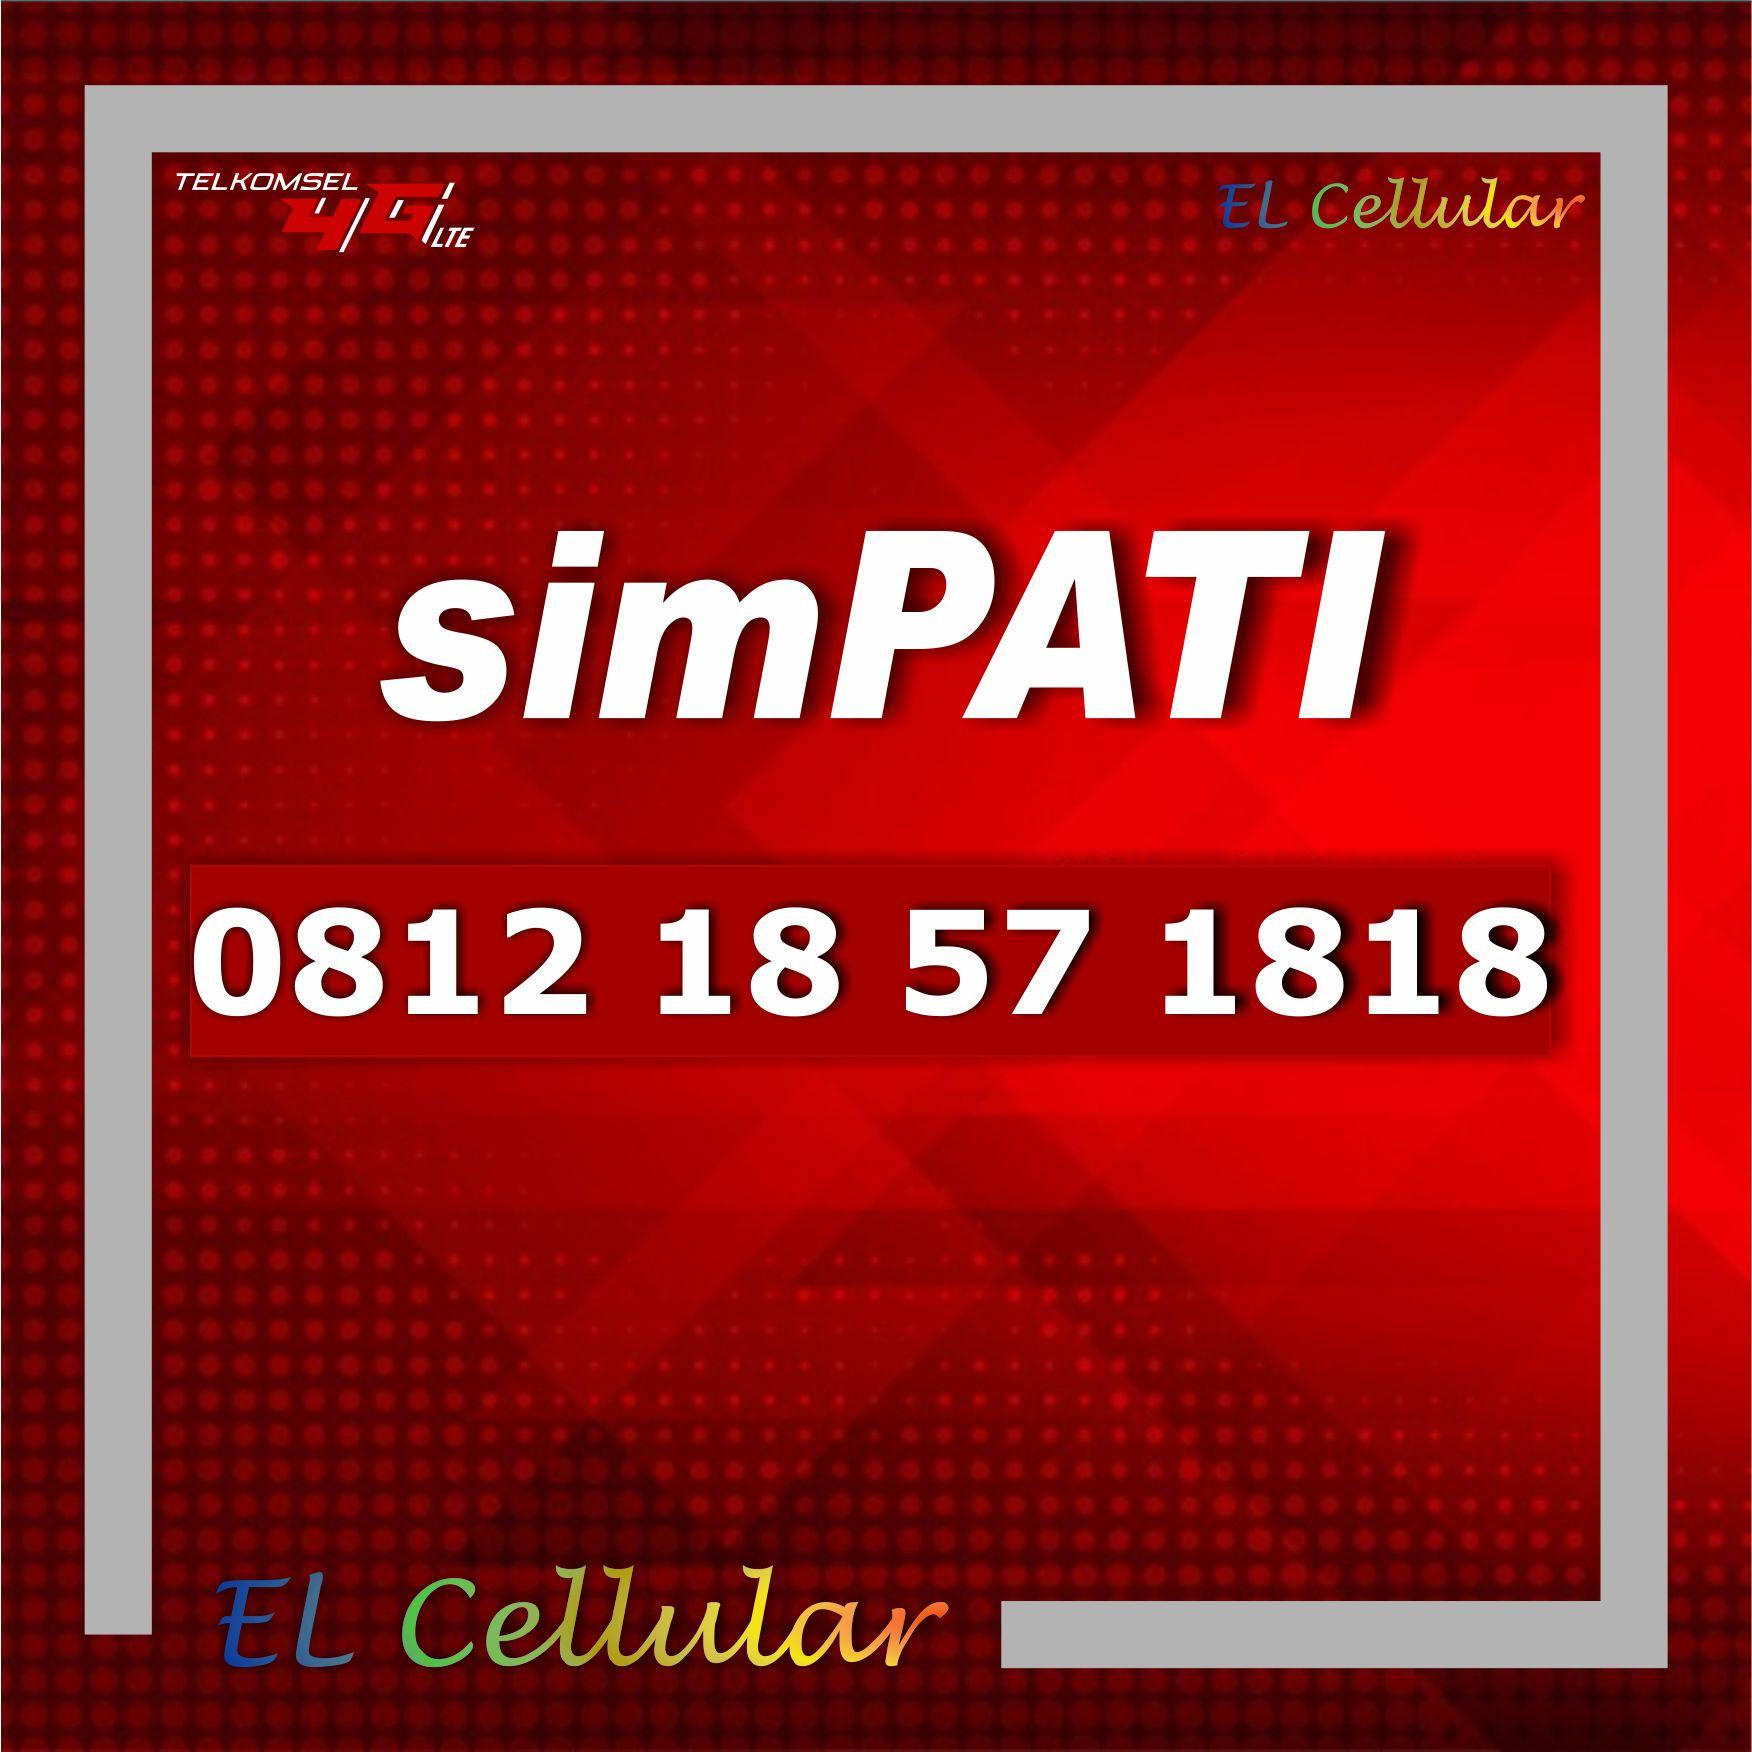 Telkomsel Simpati Nomor Cantik 0812 1818 962 Daftar Harga Source · 1710768 9bffd26e 32aa 41bc 8524 b6ec149f37f0 1752 1752 jpg